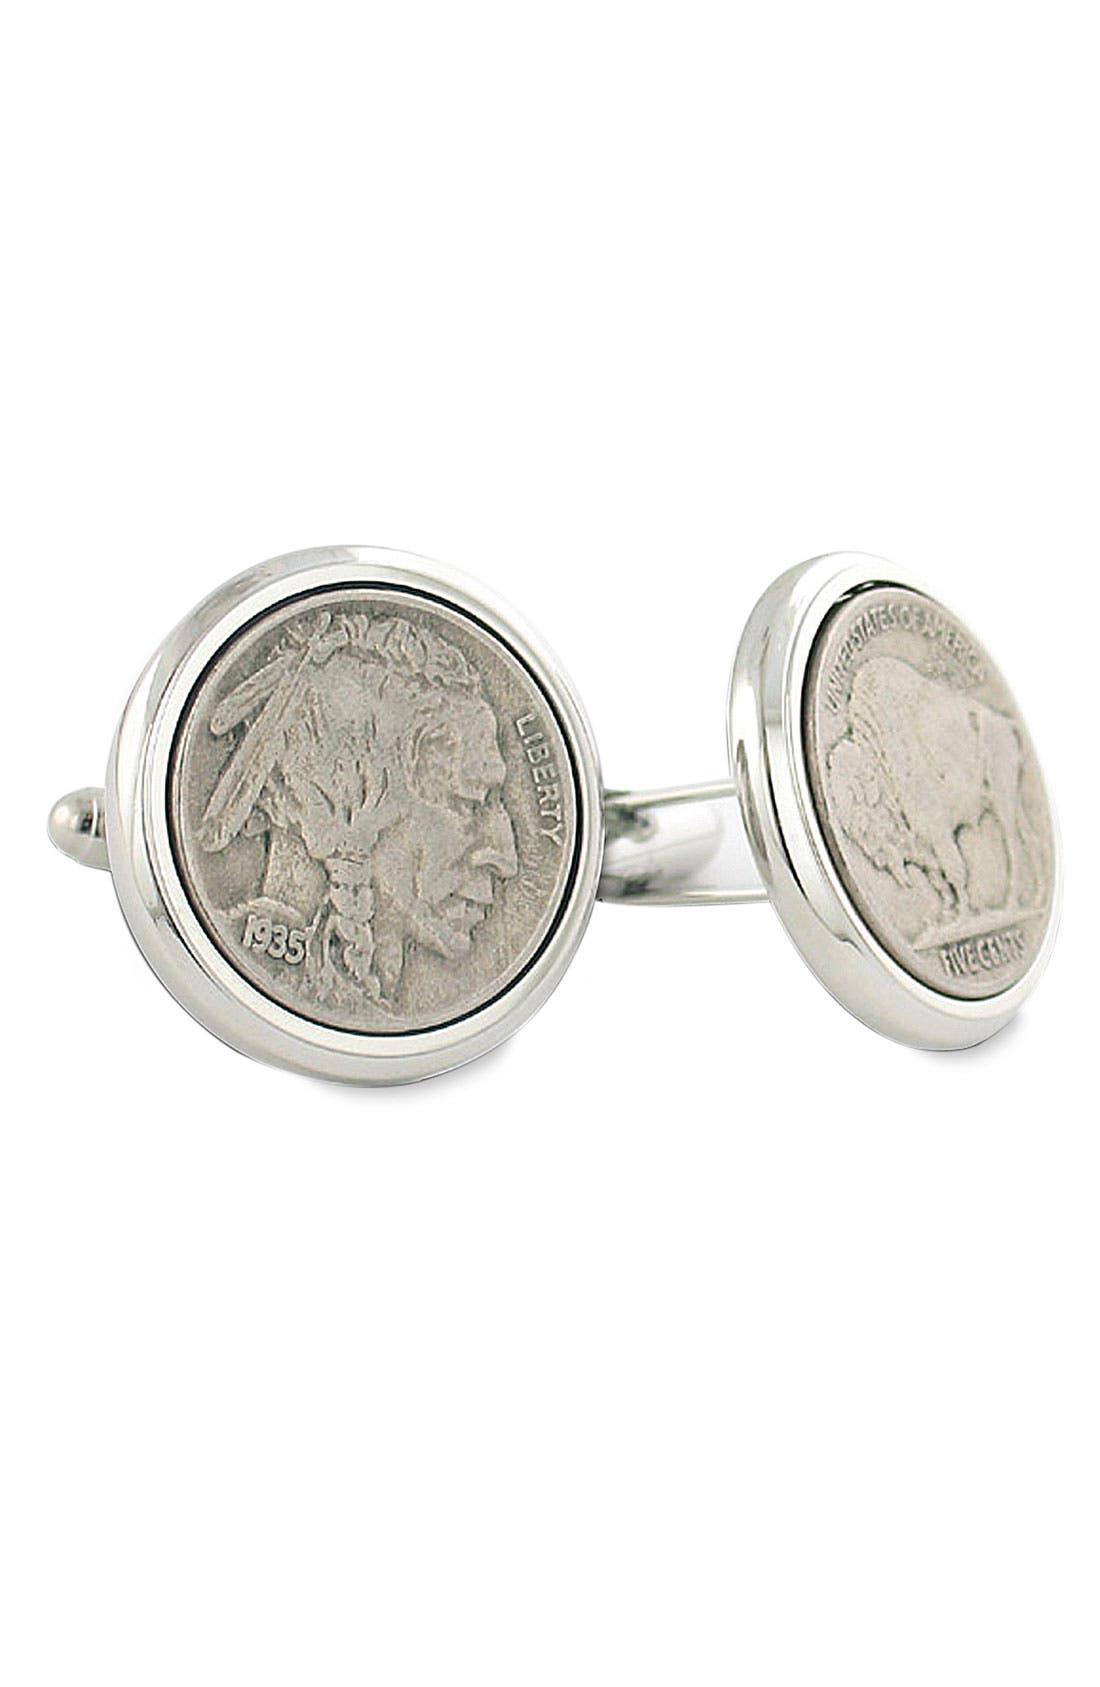 Buffalo Nickel Cuff Links,                             Main thumbnail 1, color,                             Silver Nickel